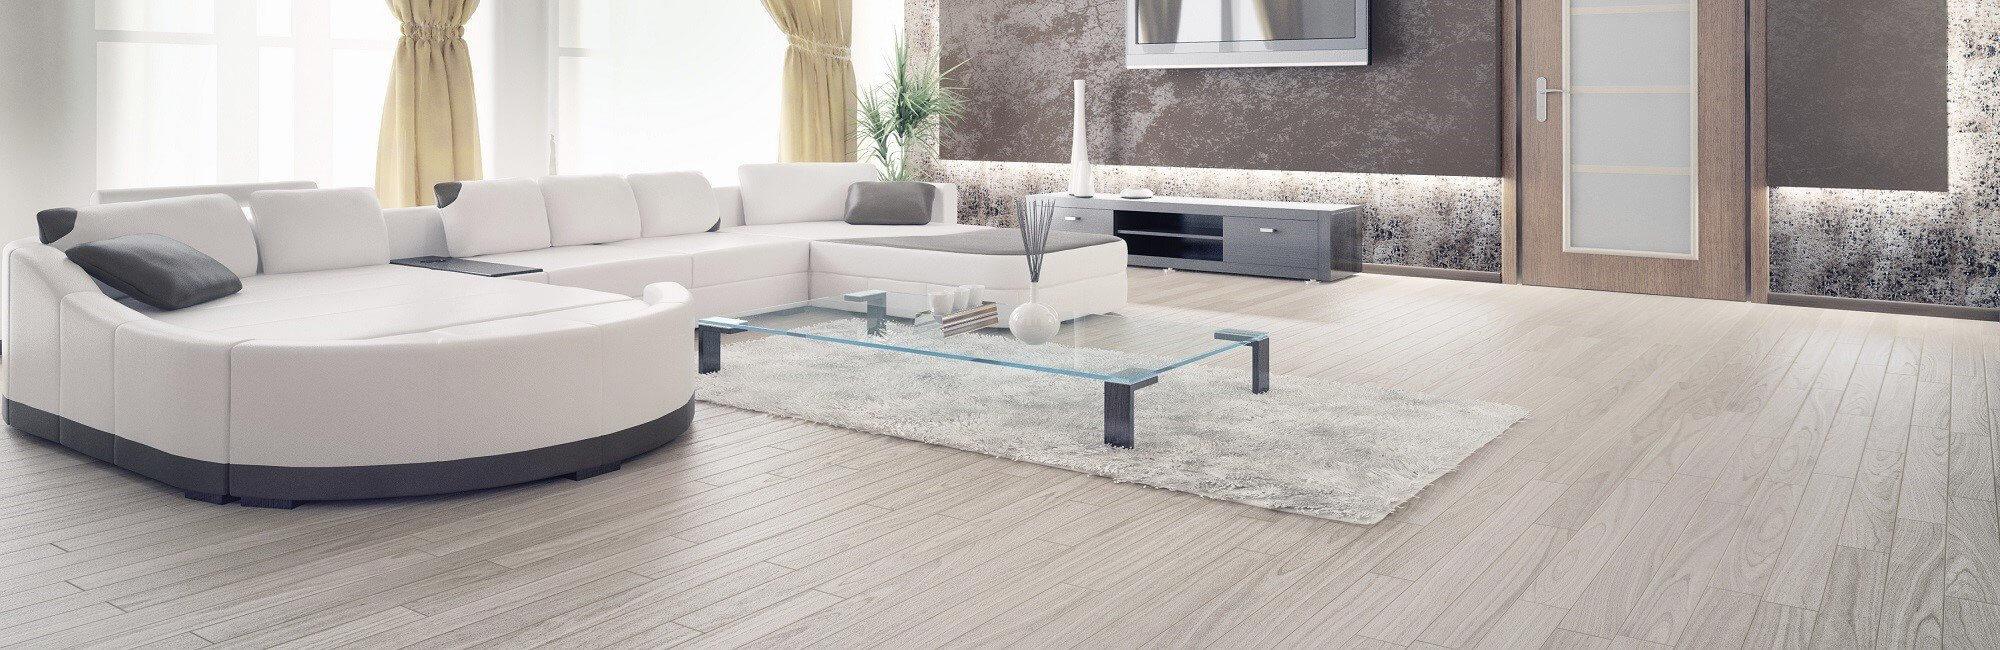 Carpet Amp Hardwood Flooring Mississauga Laminate Flooring